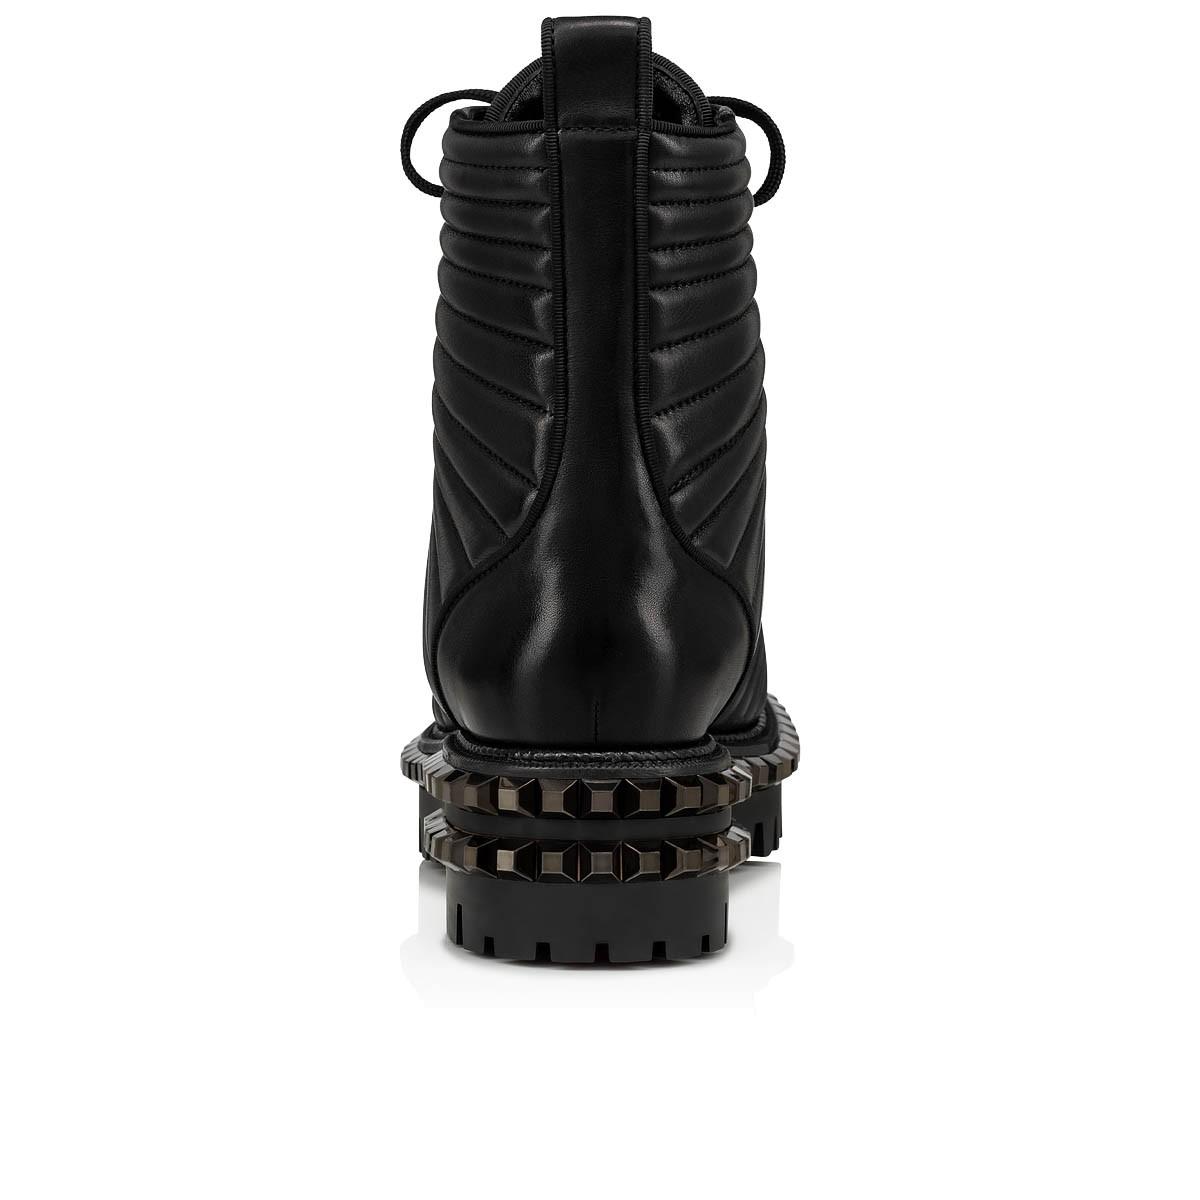 Shoes - Yetota - Christian Louboutin